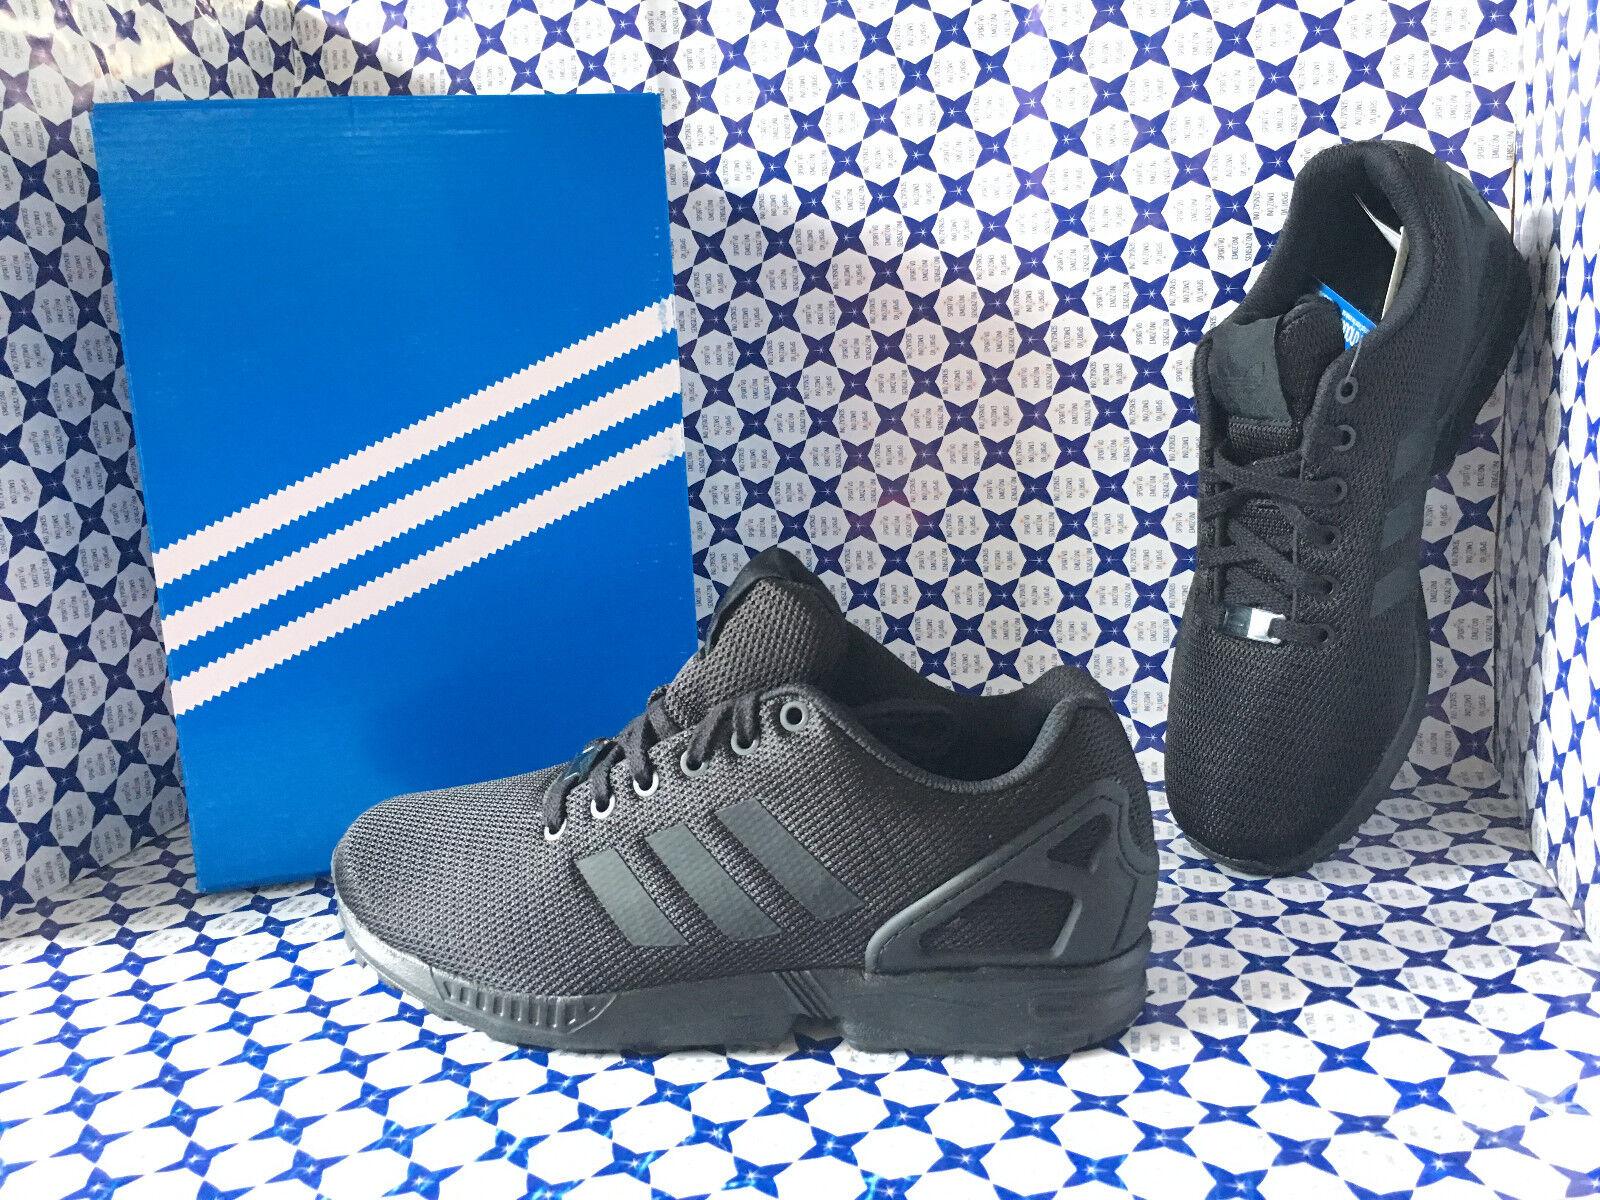 shoes Adidas Originals ZX Flux men - Sneakers - black - S32279